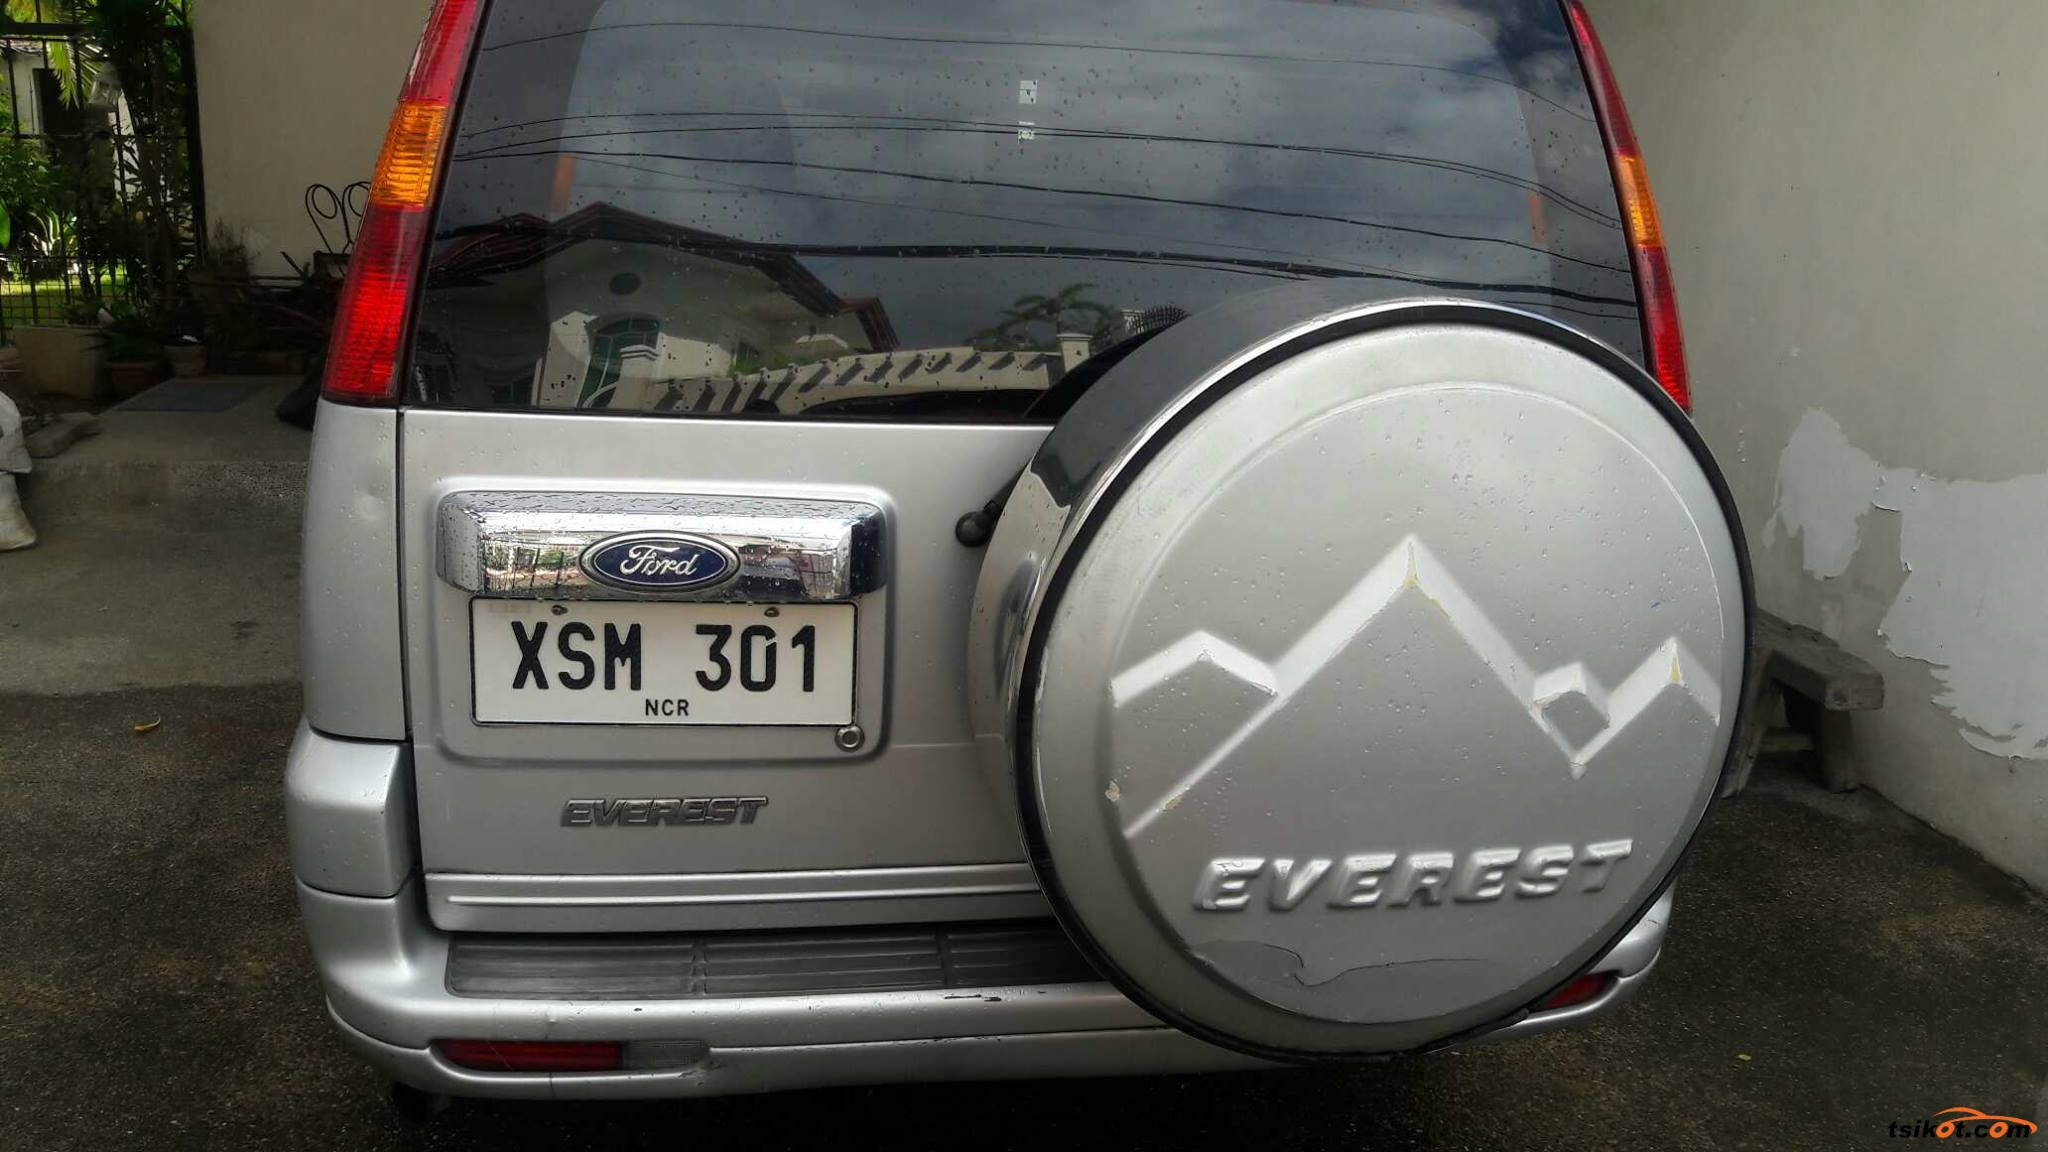 Ford Everest 2004 - 2